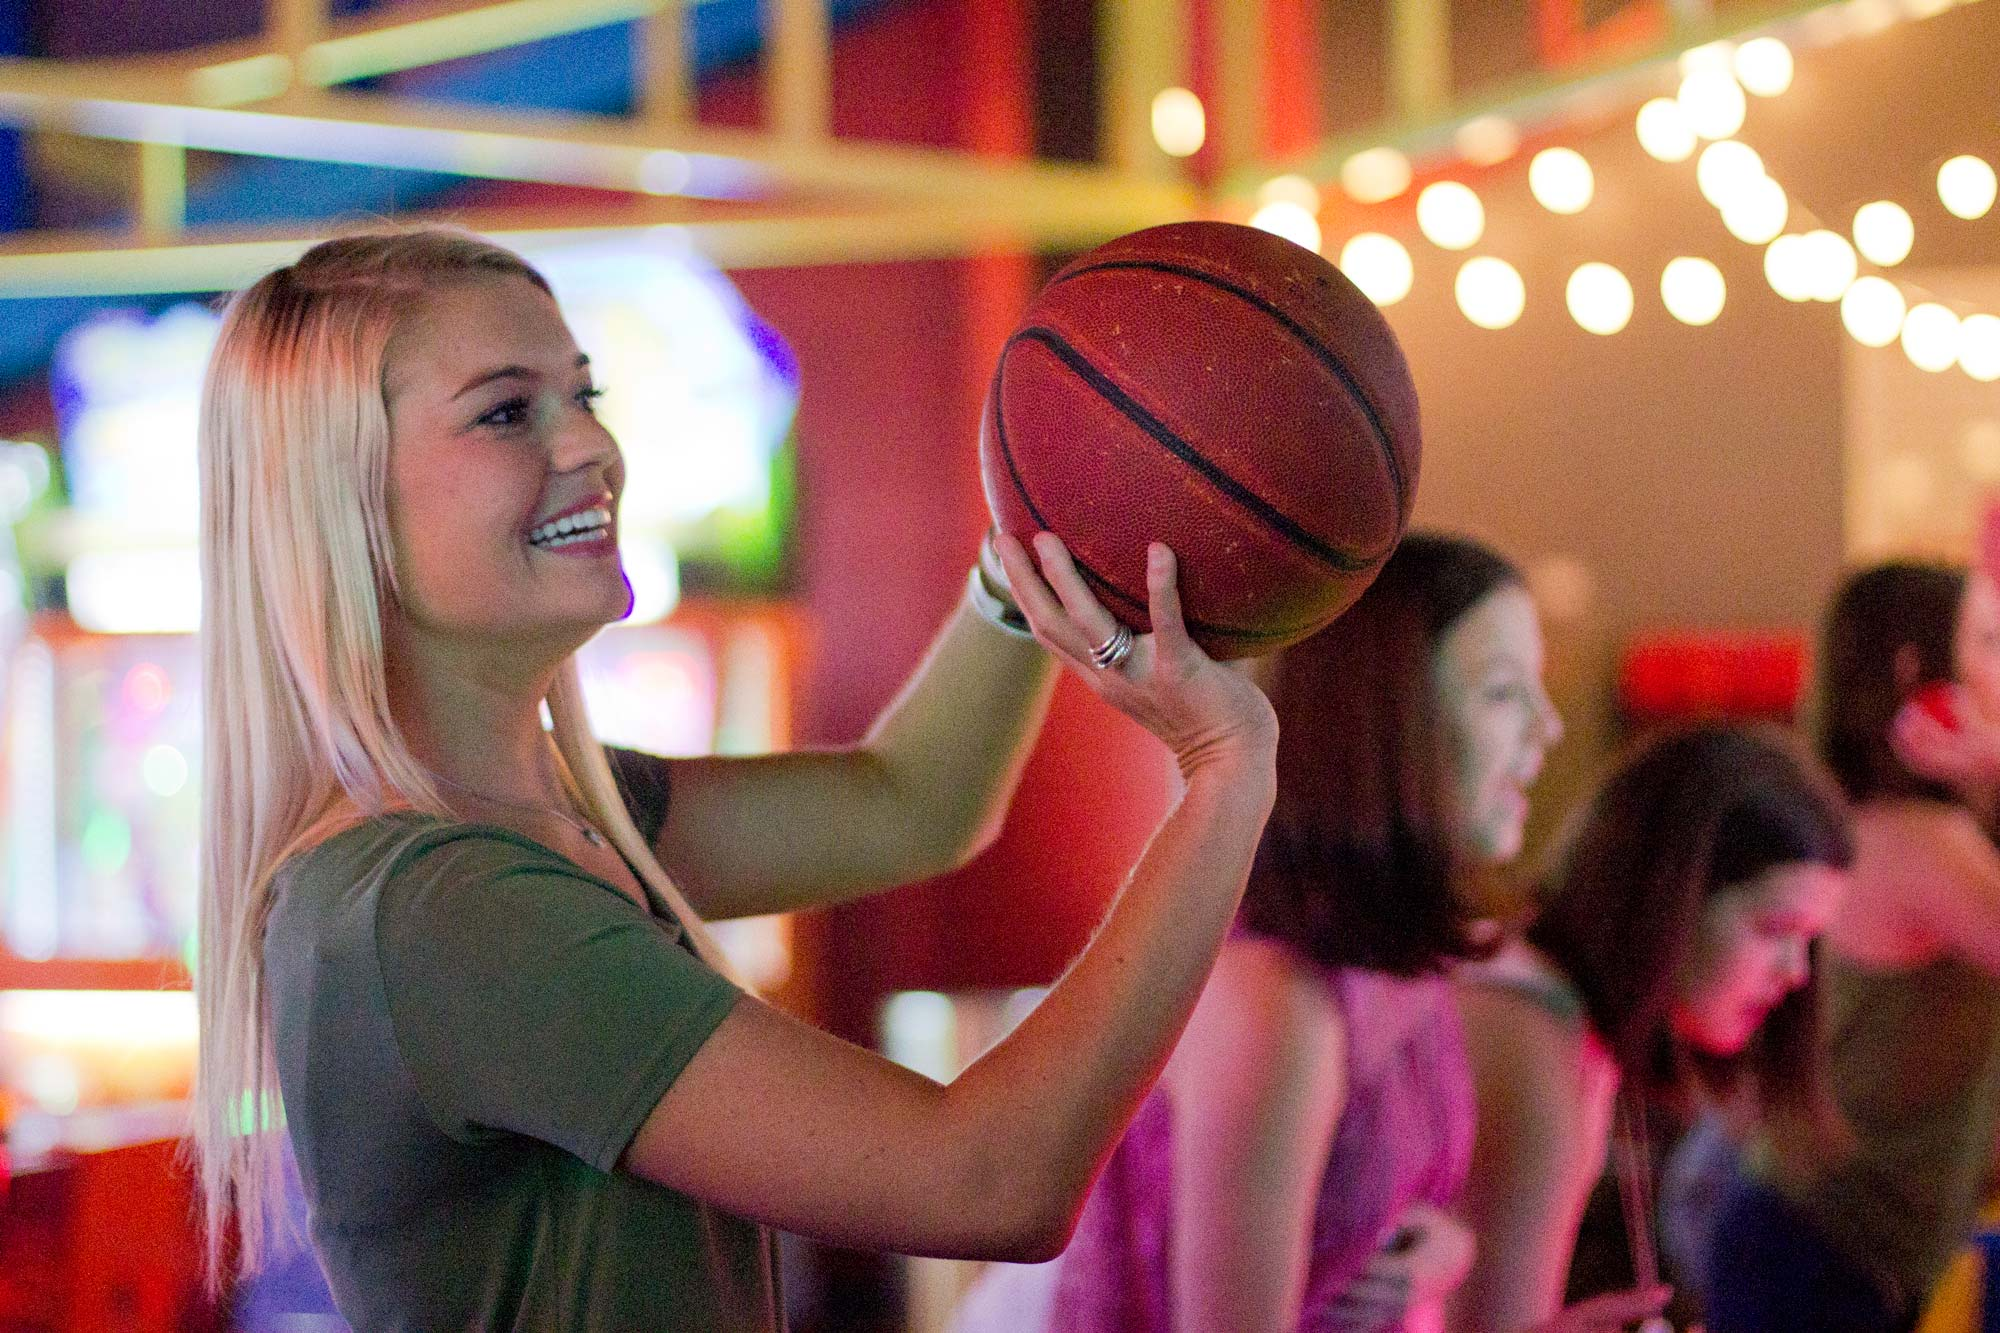 Copy of Basketball Arcade Games